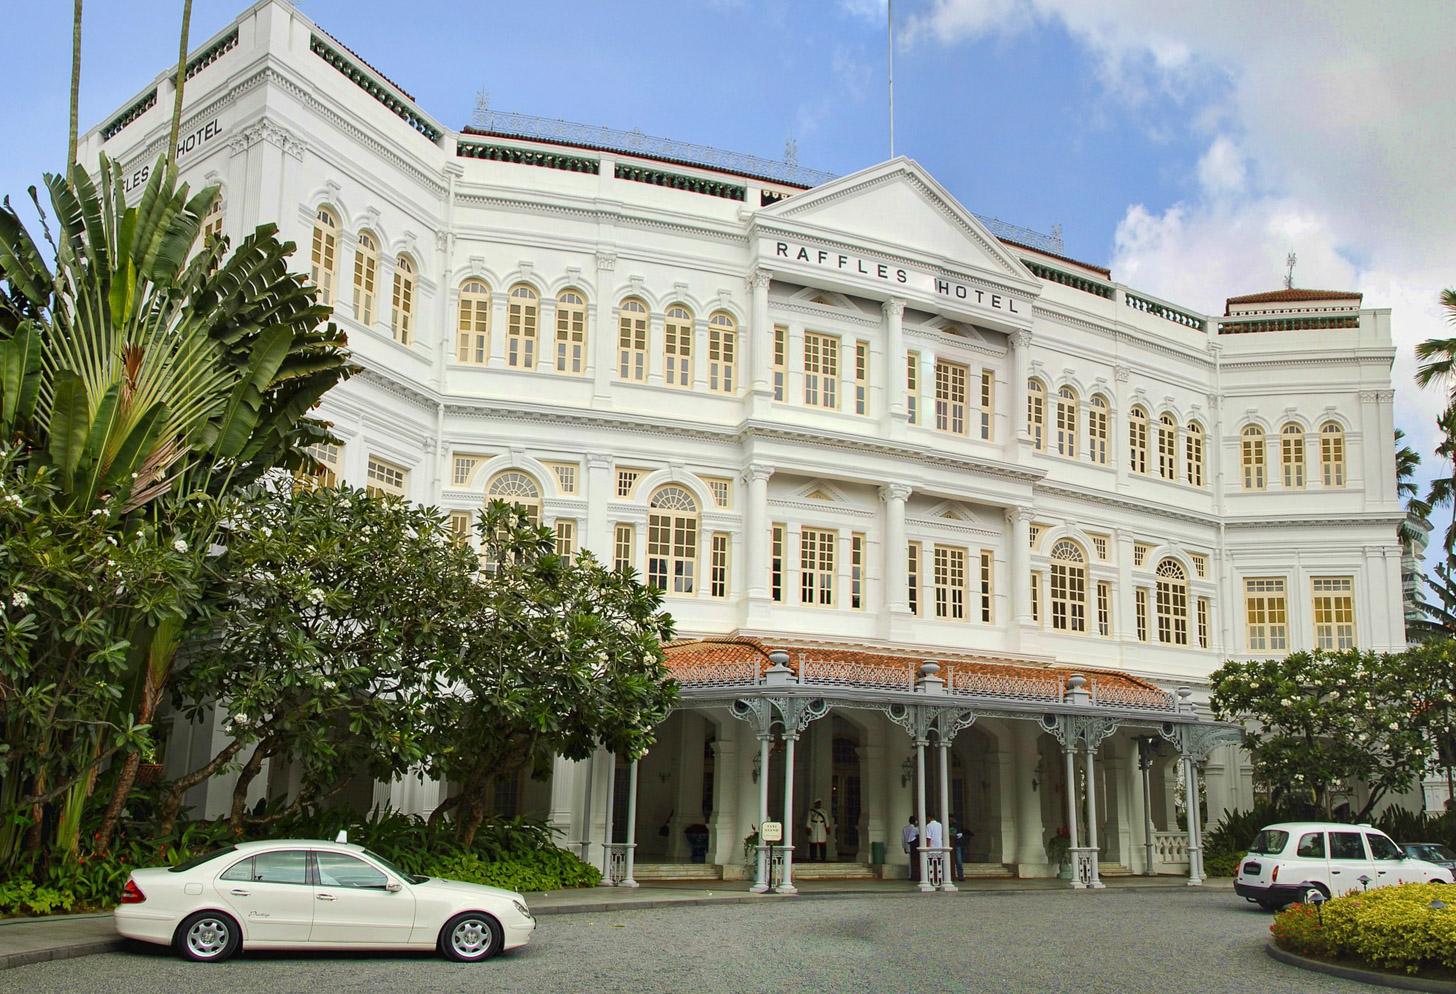 Het Raffles Hotel in Singapore